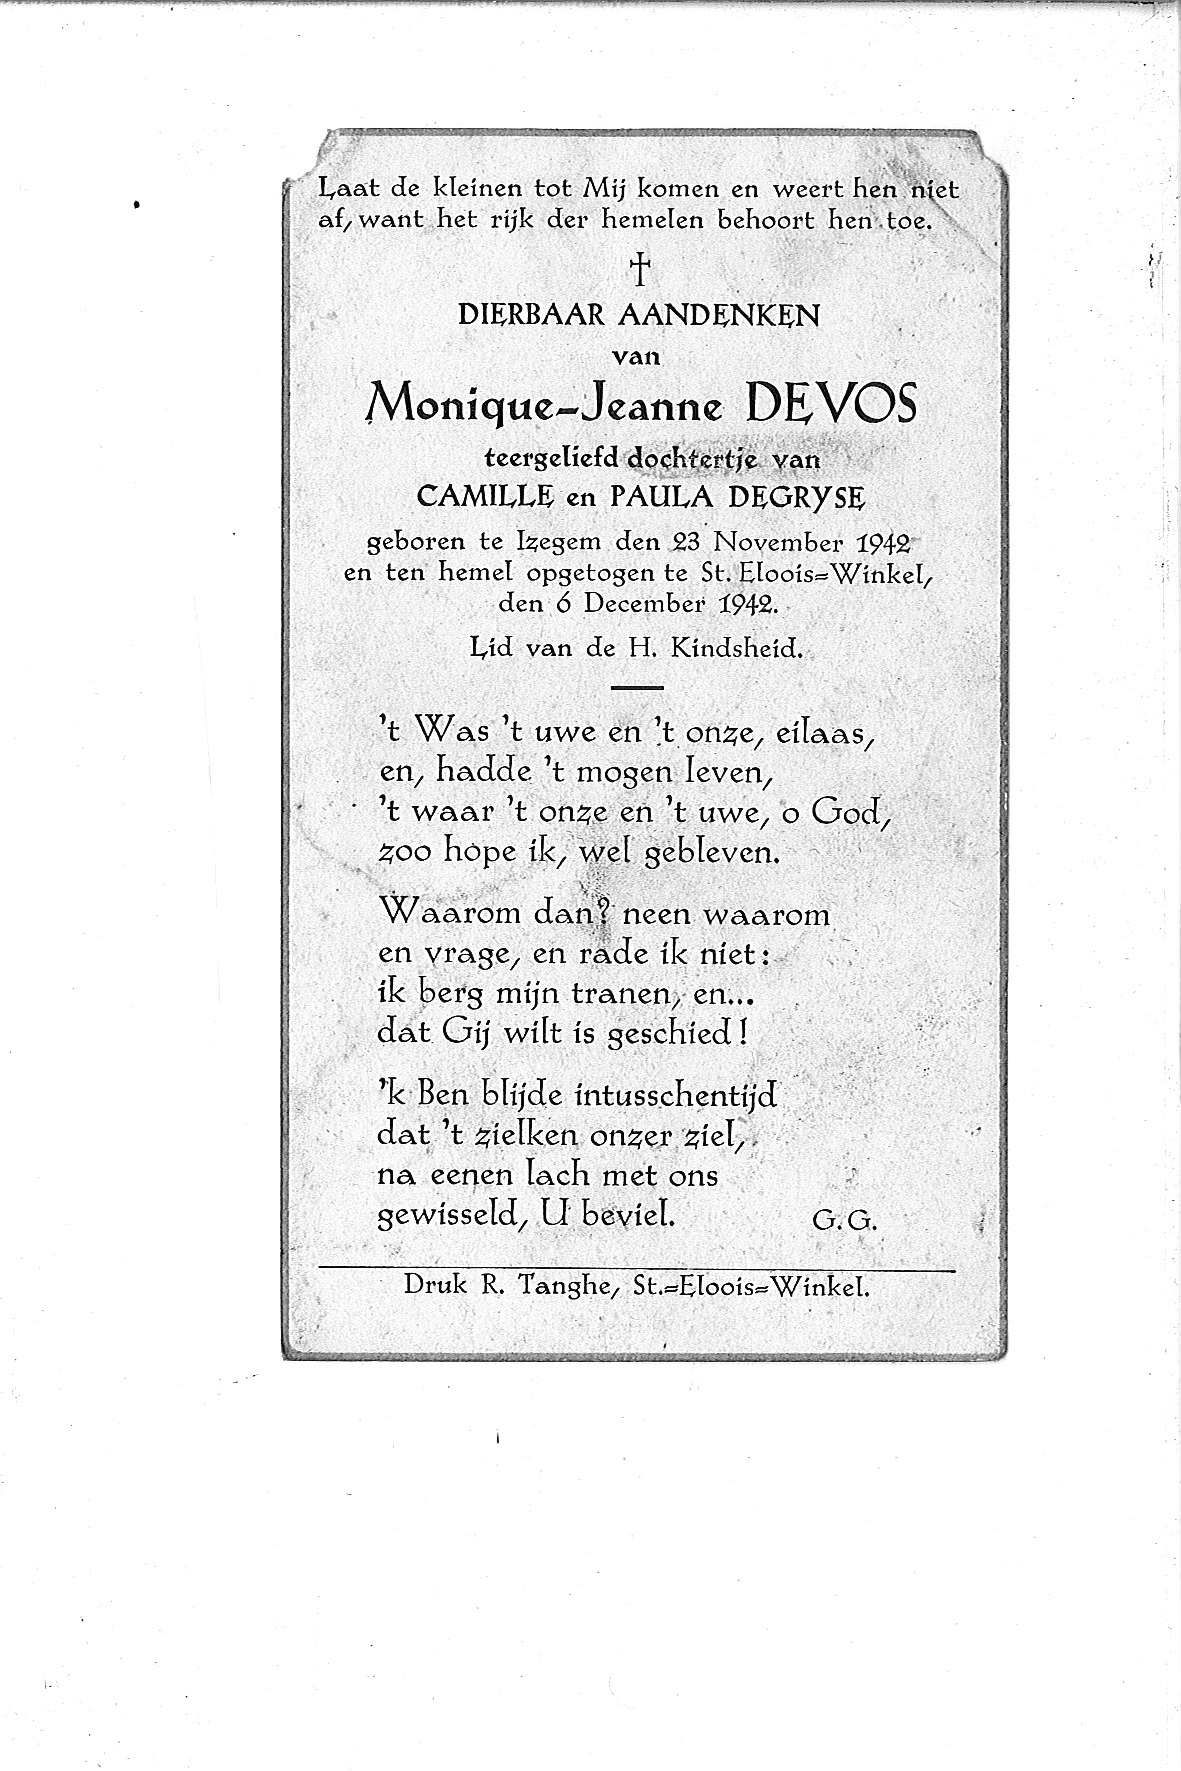 Monique-Jeanne (1942) 20120306142406_00243.jpg